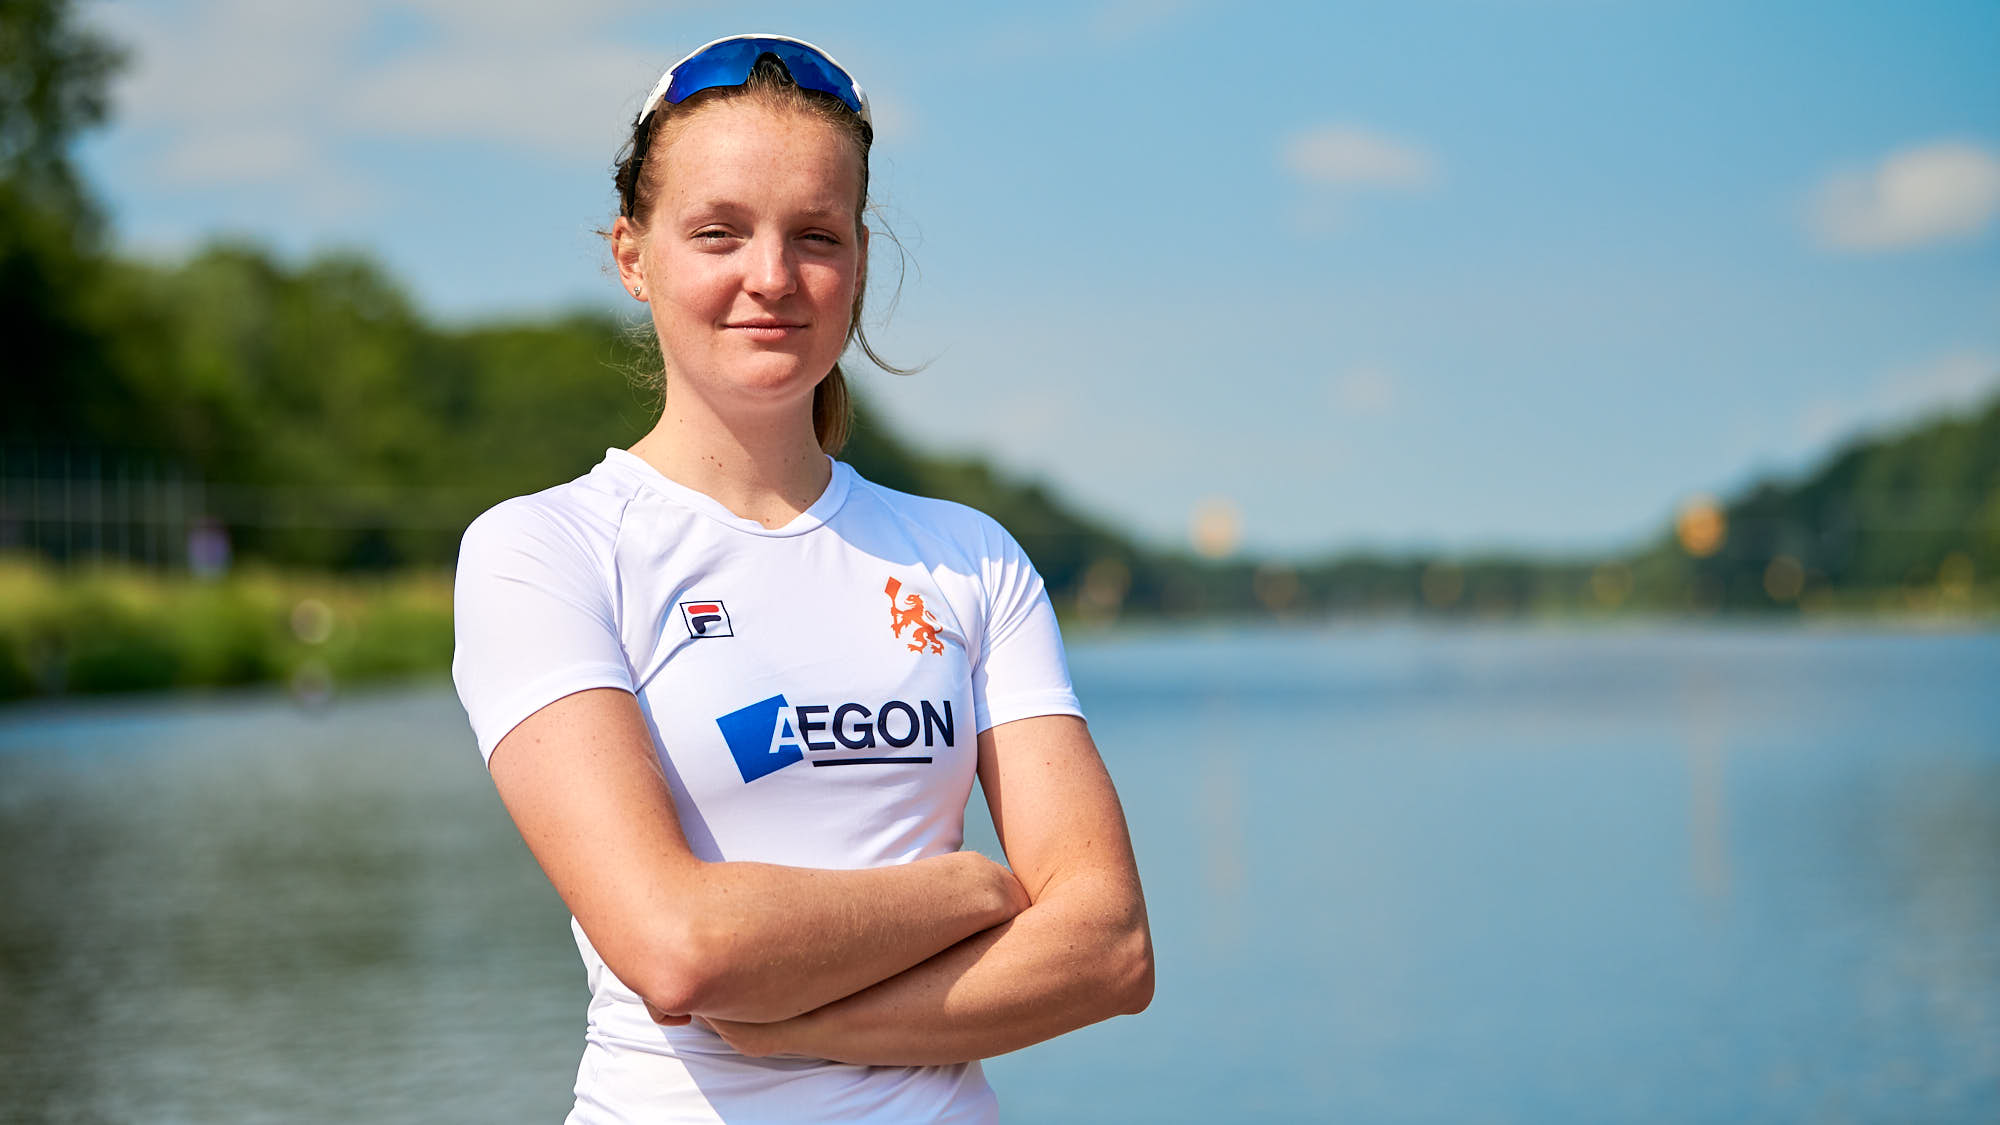 Portrait of top Dutch athlete Marieke Keijser